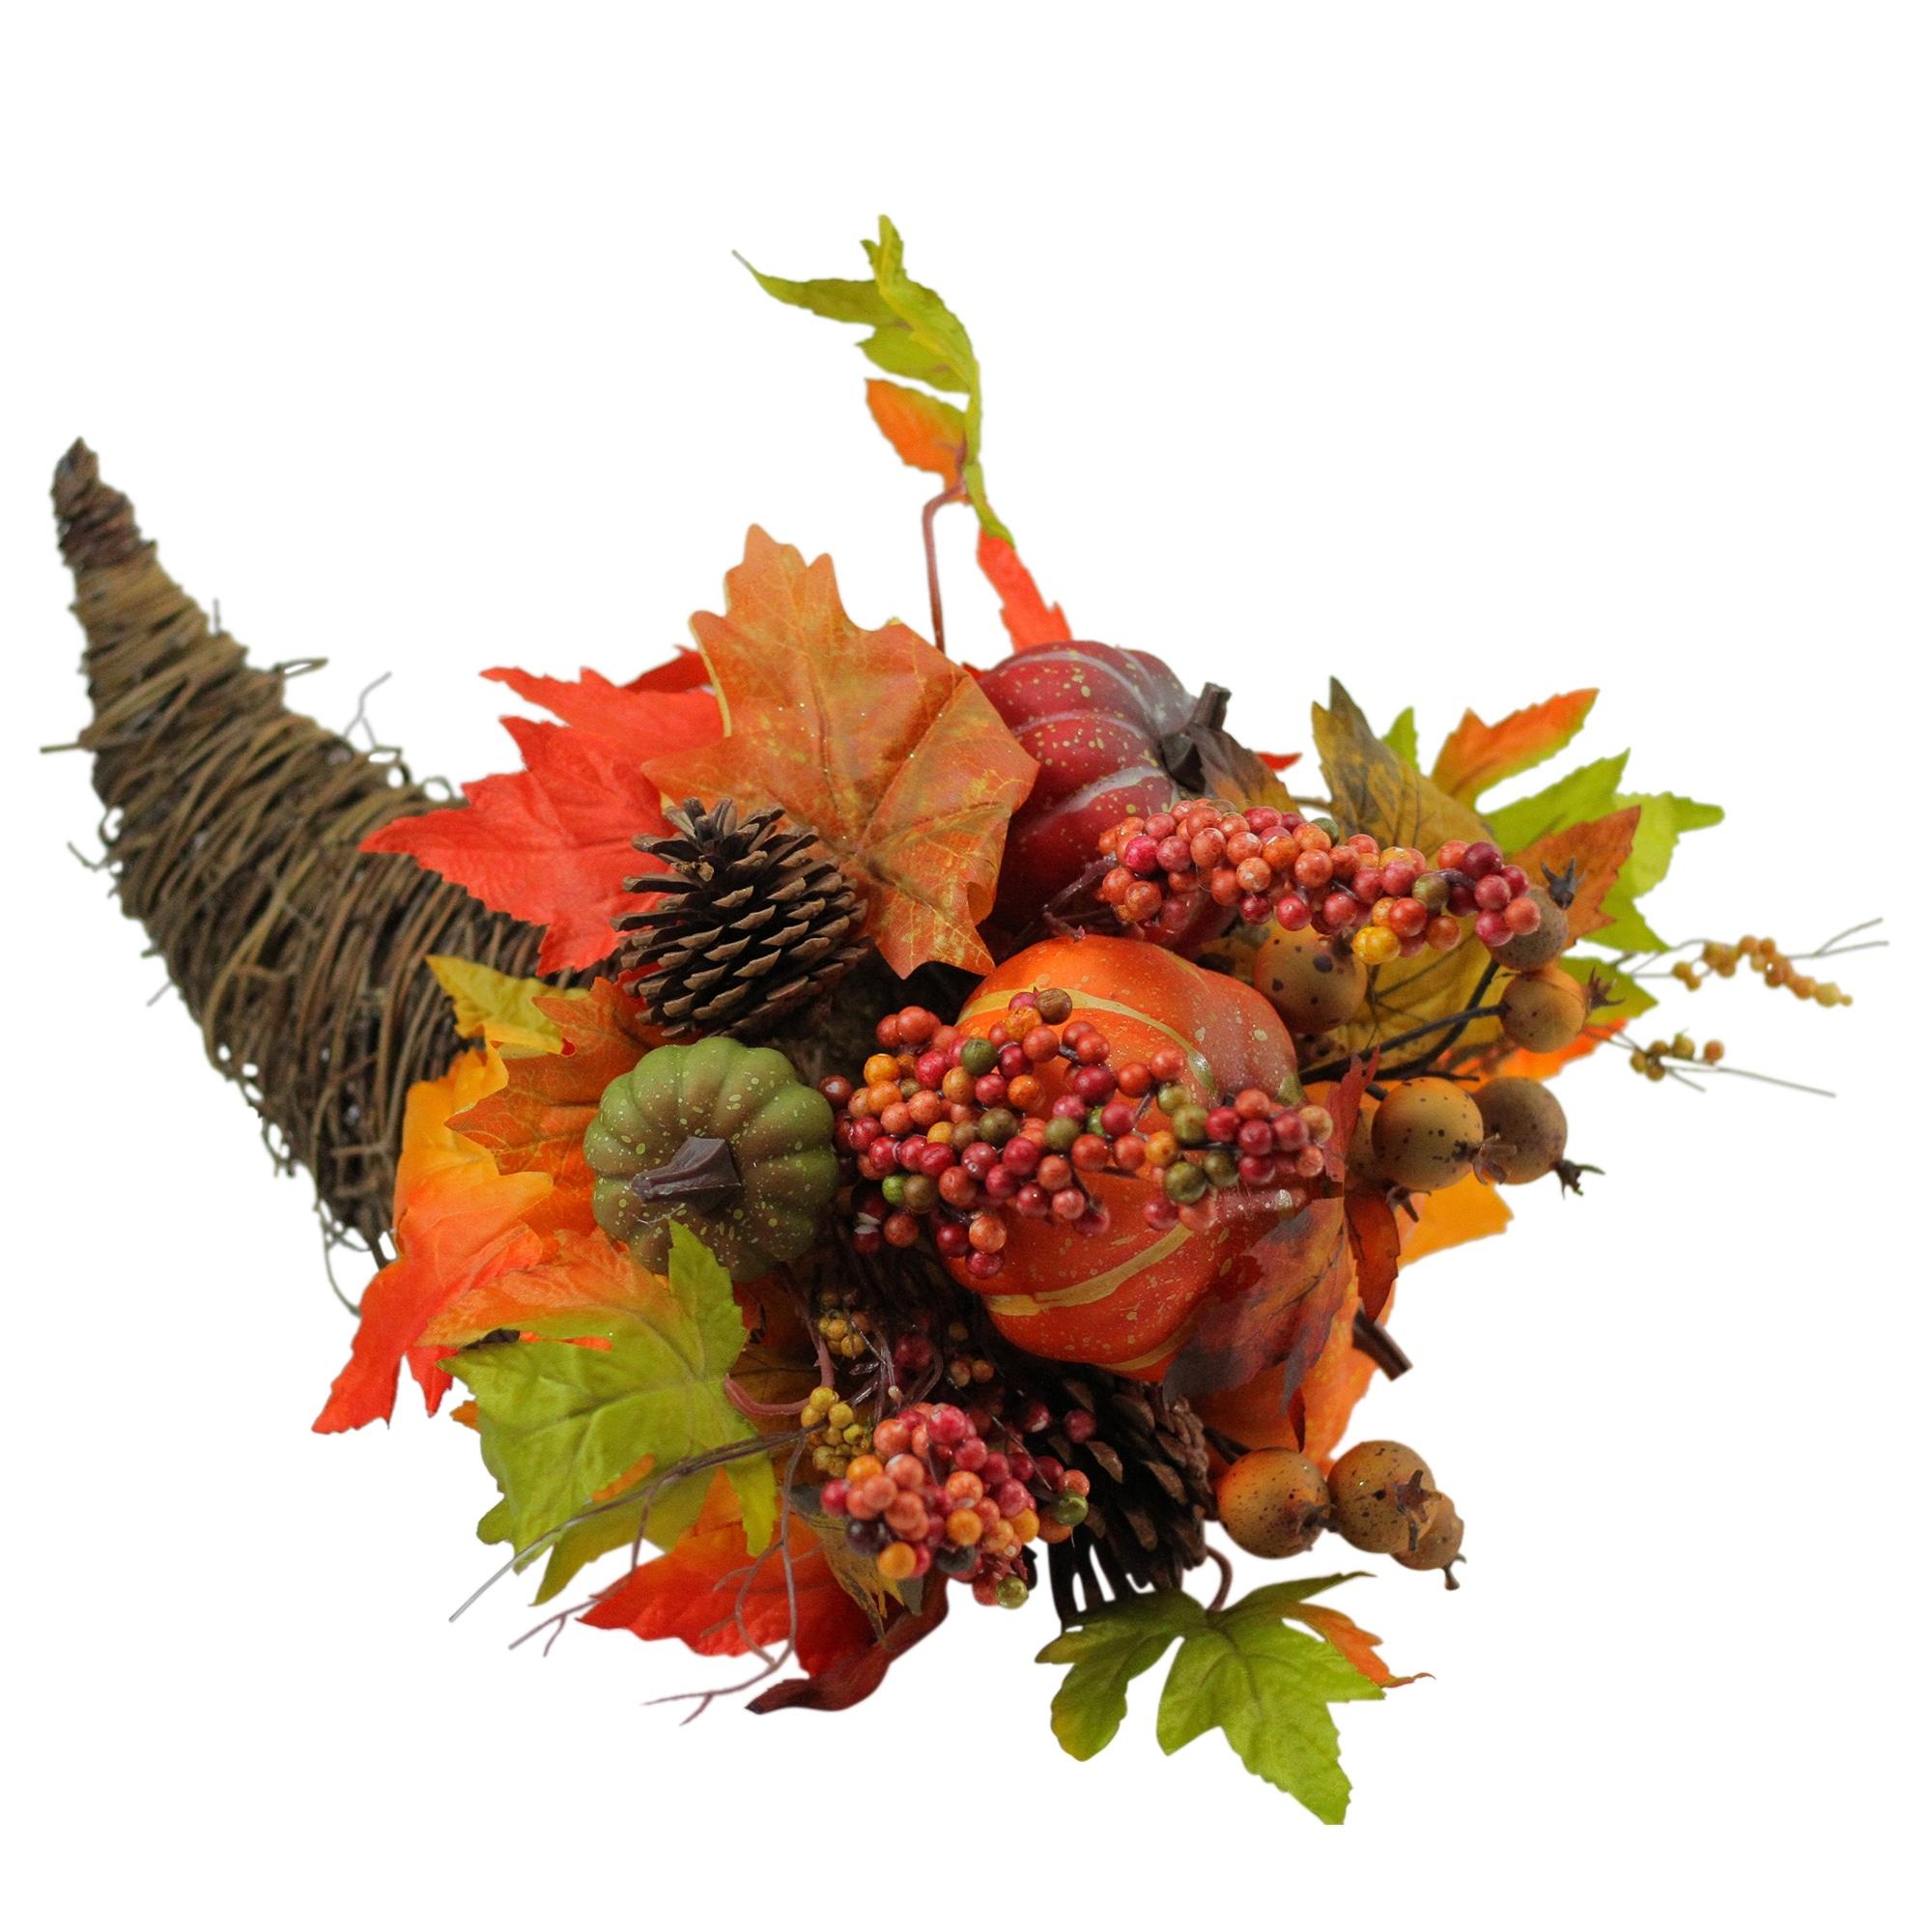 16 Autumn Harvest Gourds and Maple Leaf Cornucopia Thanksgiving Decoration - N/A